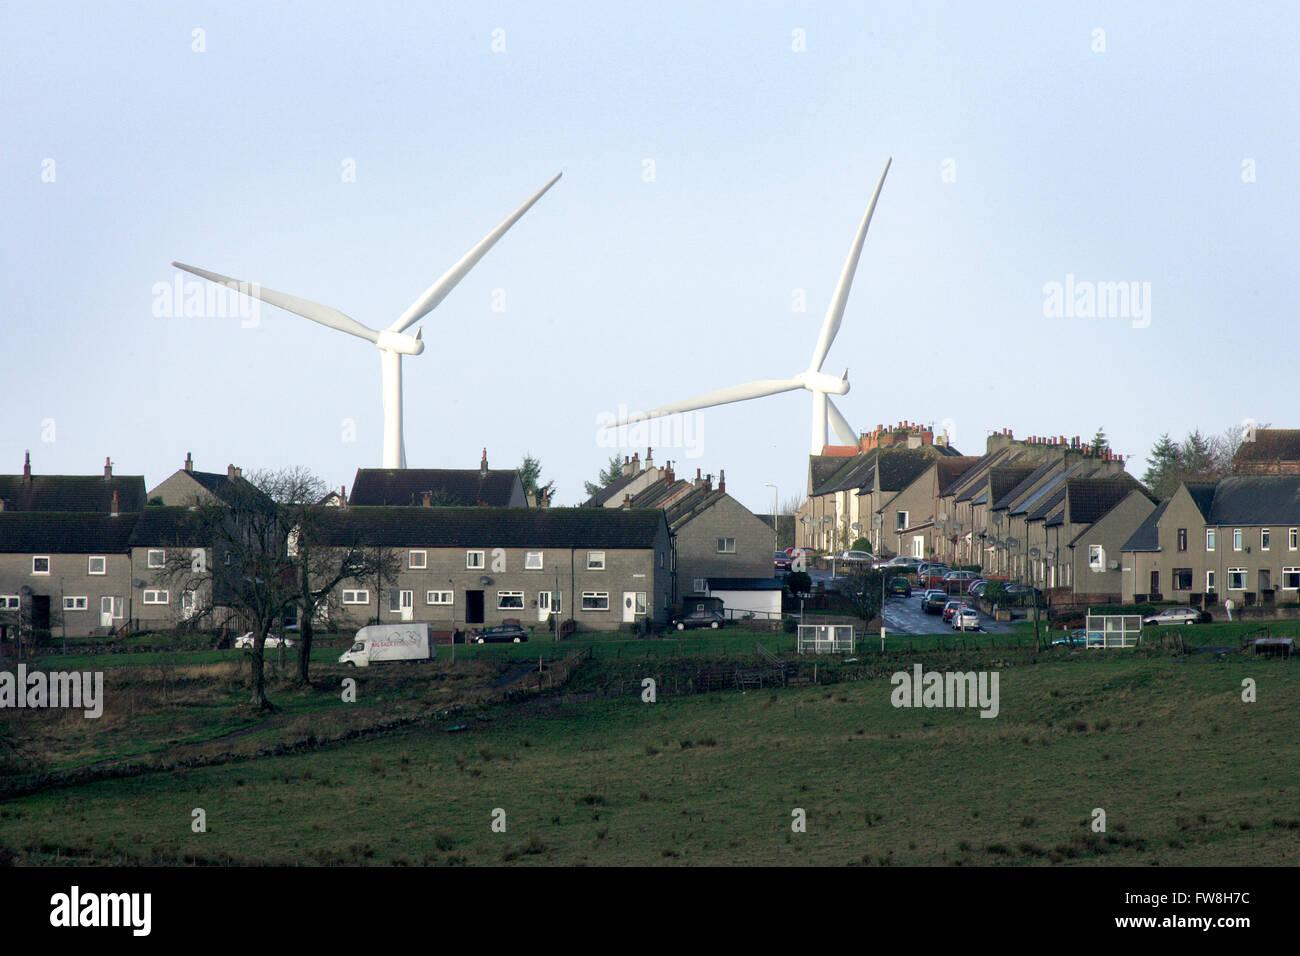 Wind Farm close to village of Forth , Lanarkshire Scotland - Stock Image